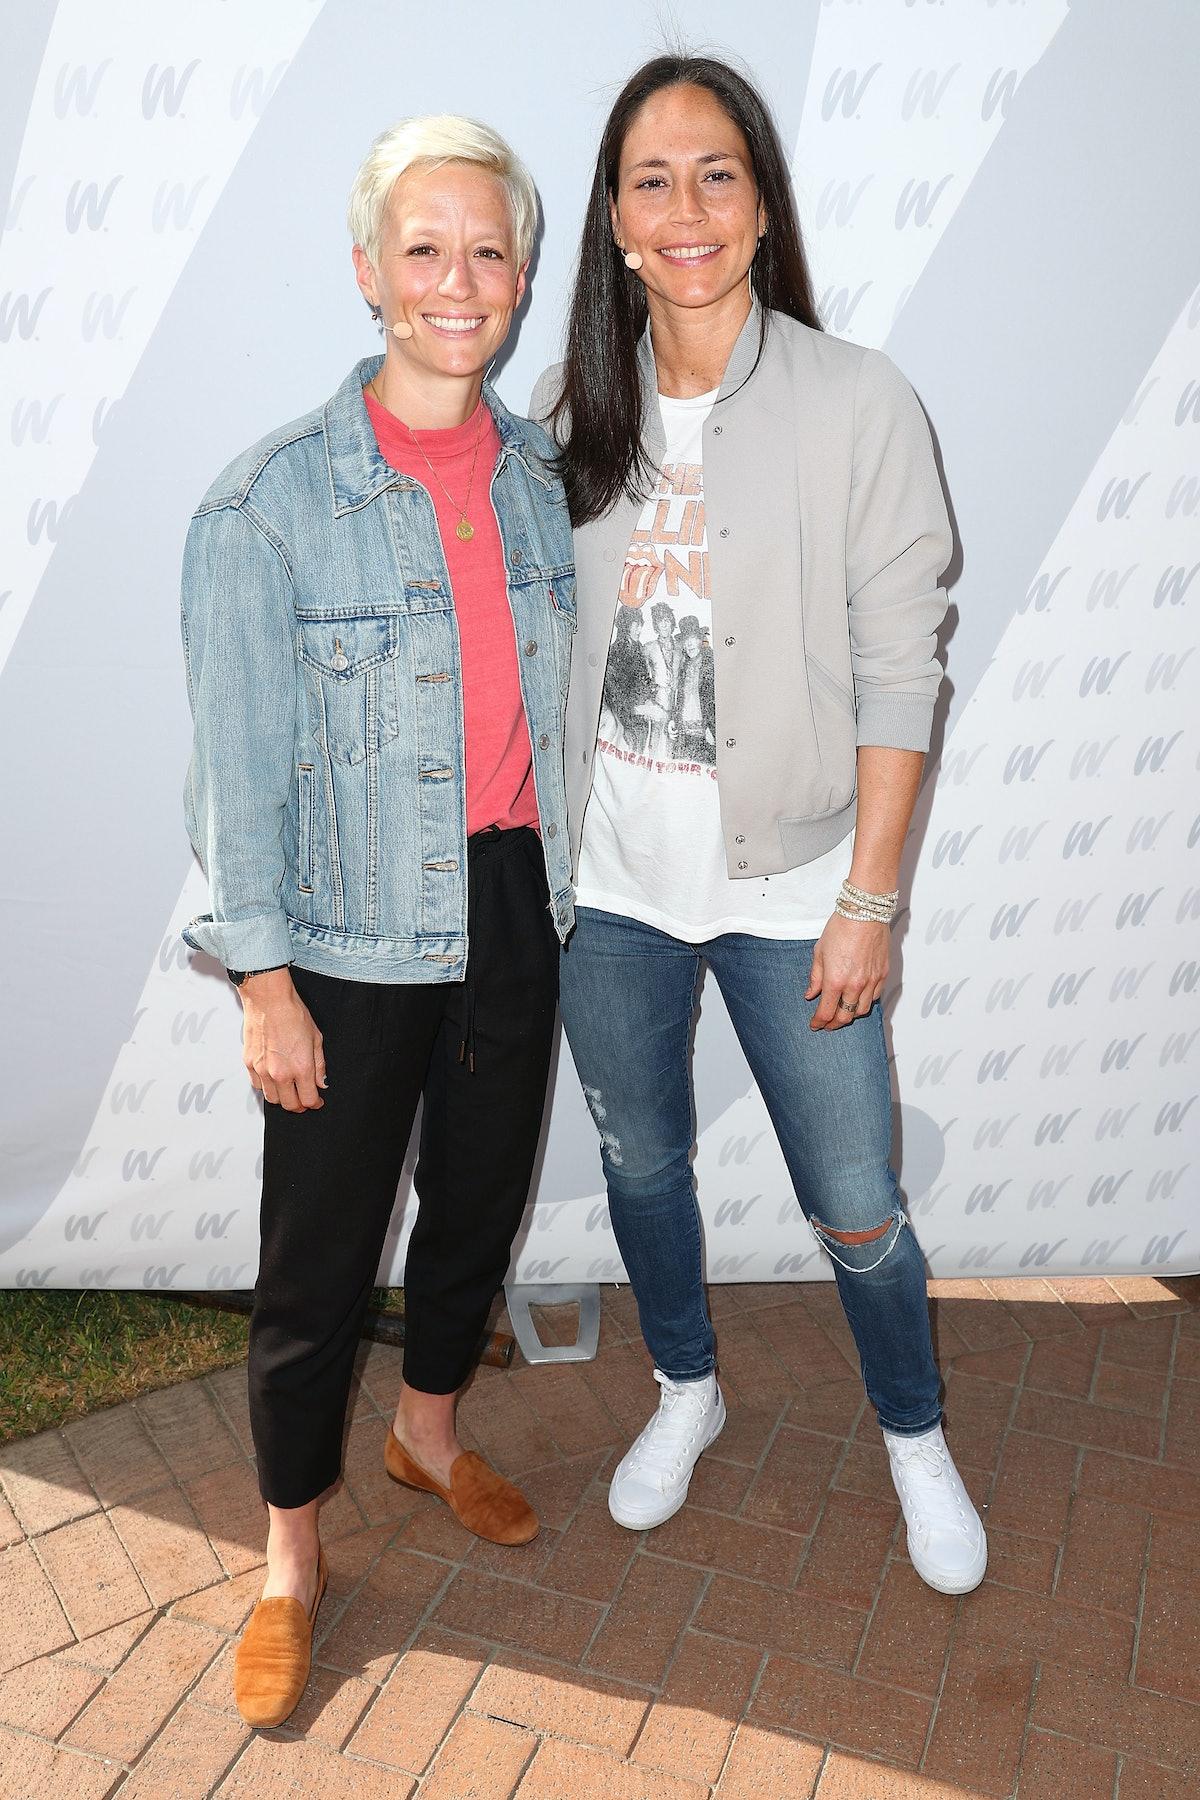 Megan Rapinoe & Sue Bird met at a photo shoot for the 2016 Olympics.